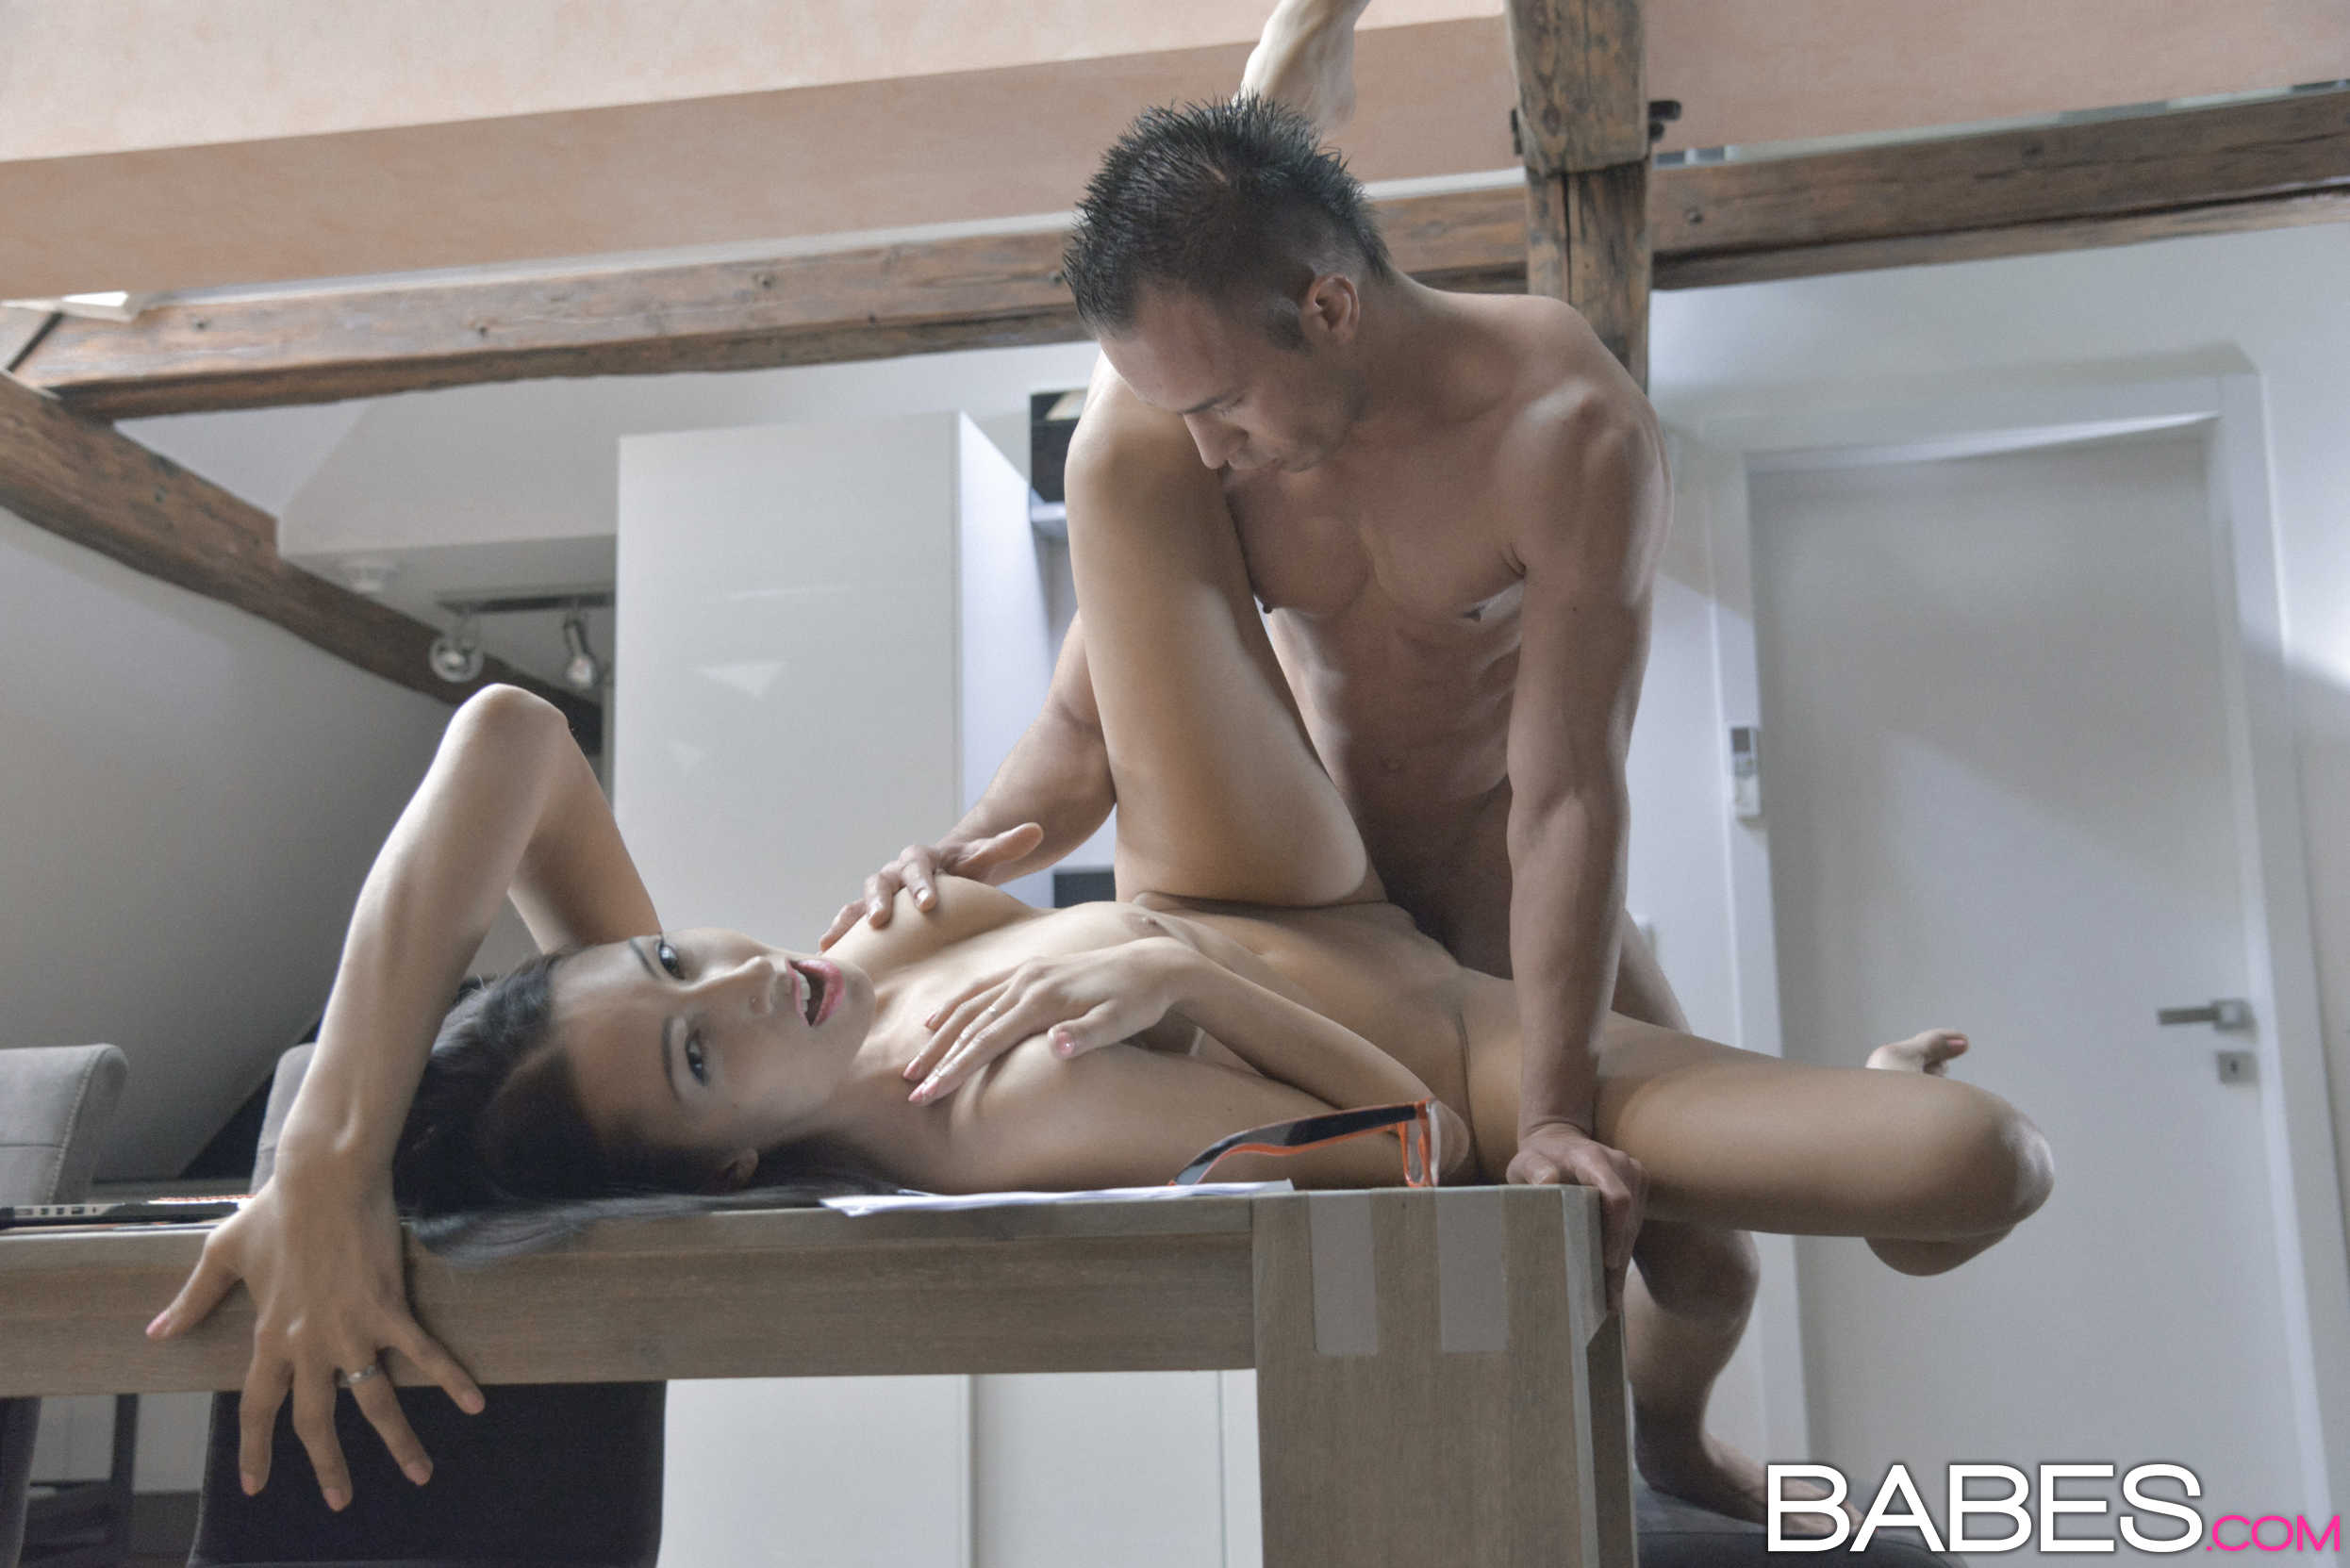 kitty jane erotika video